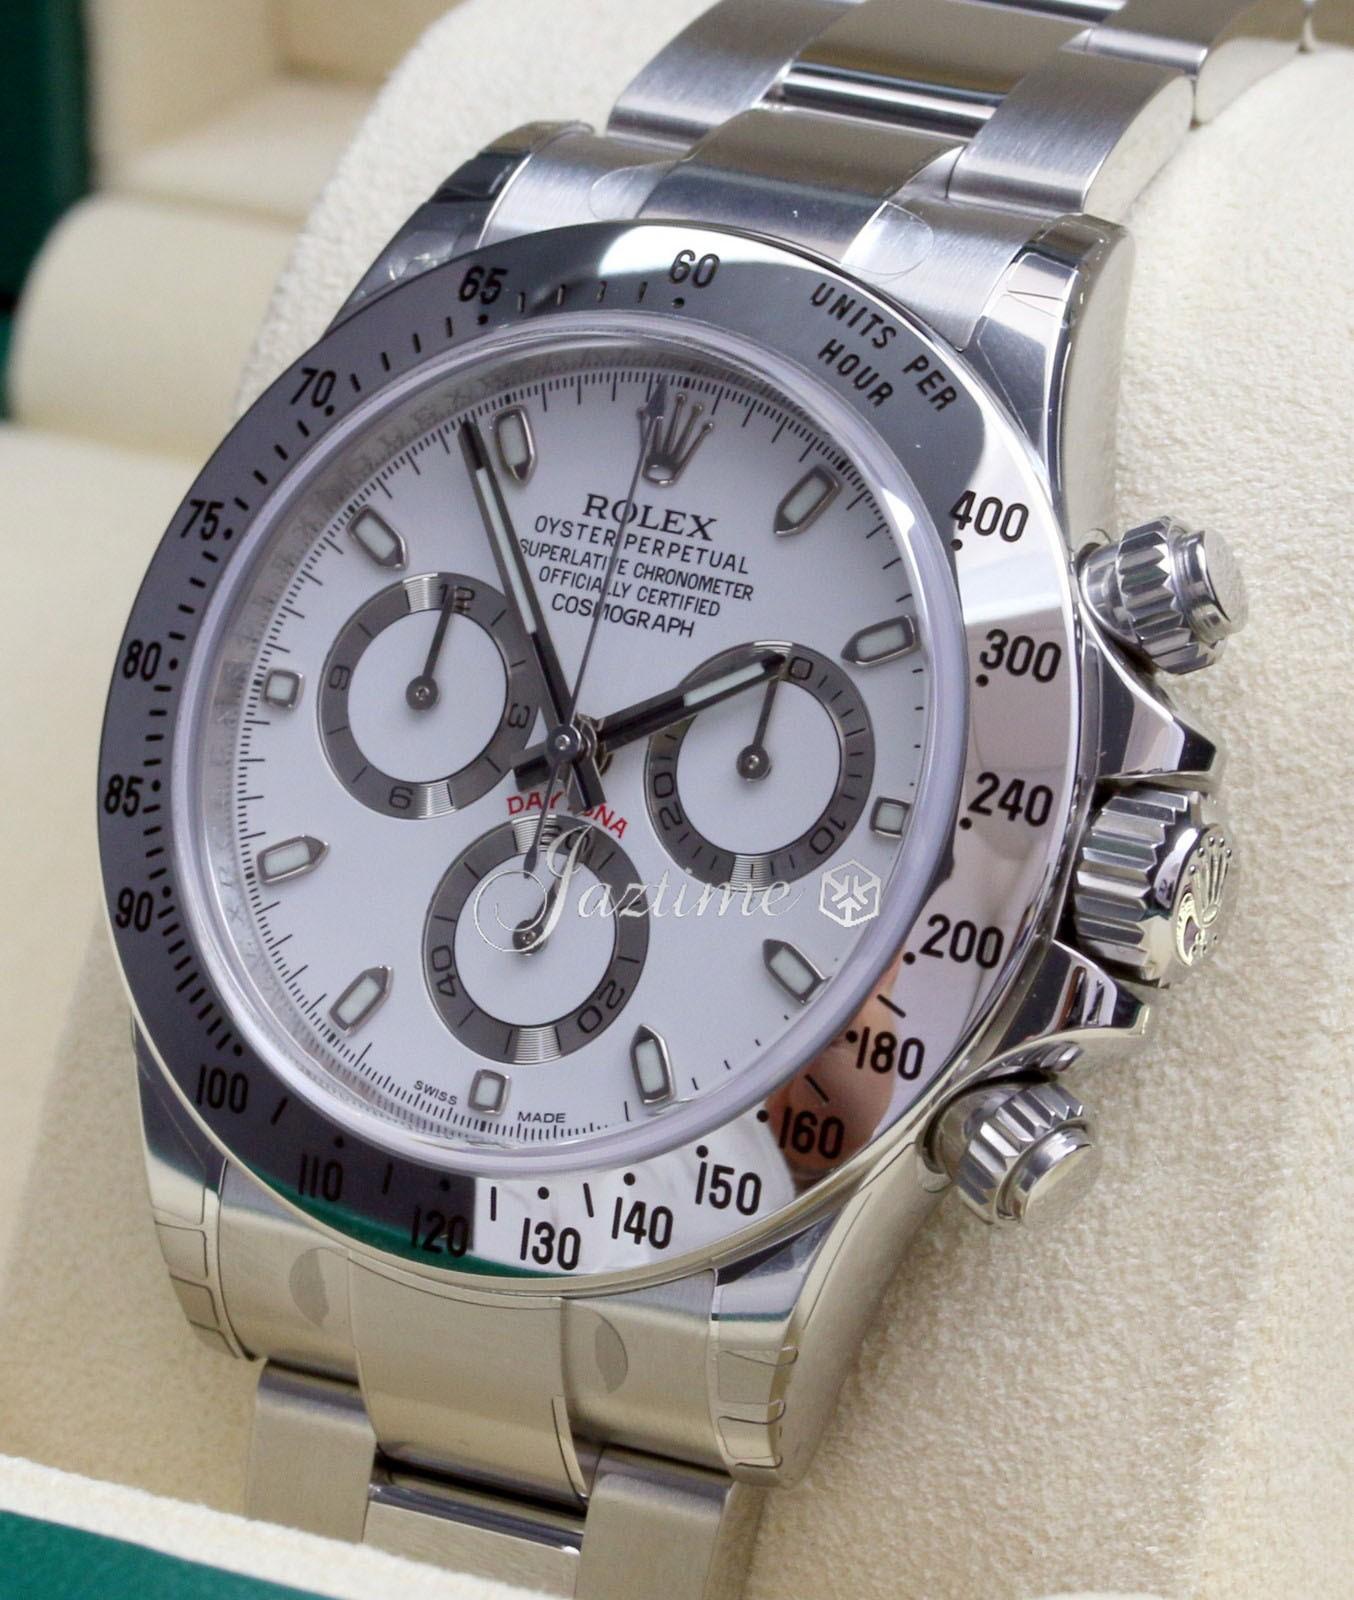 Rolex Daytona Price Stainless Steel Cheap Watches Mgc Gas Com